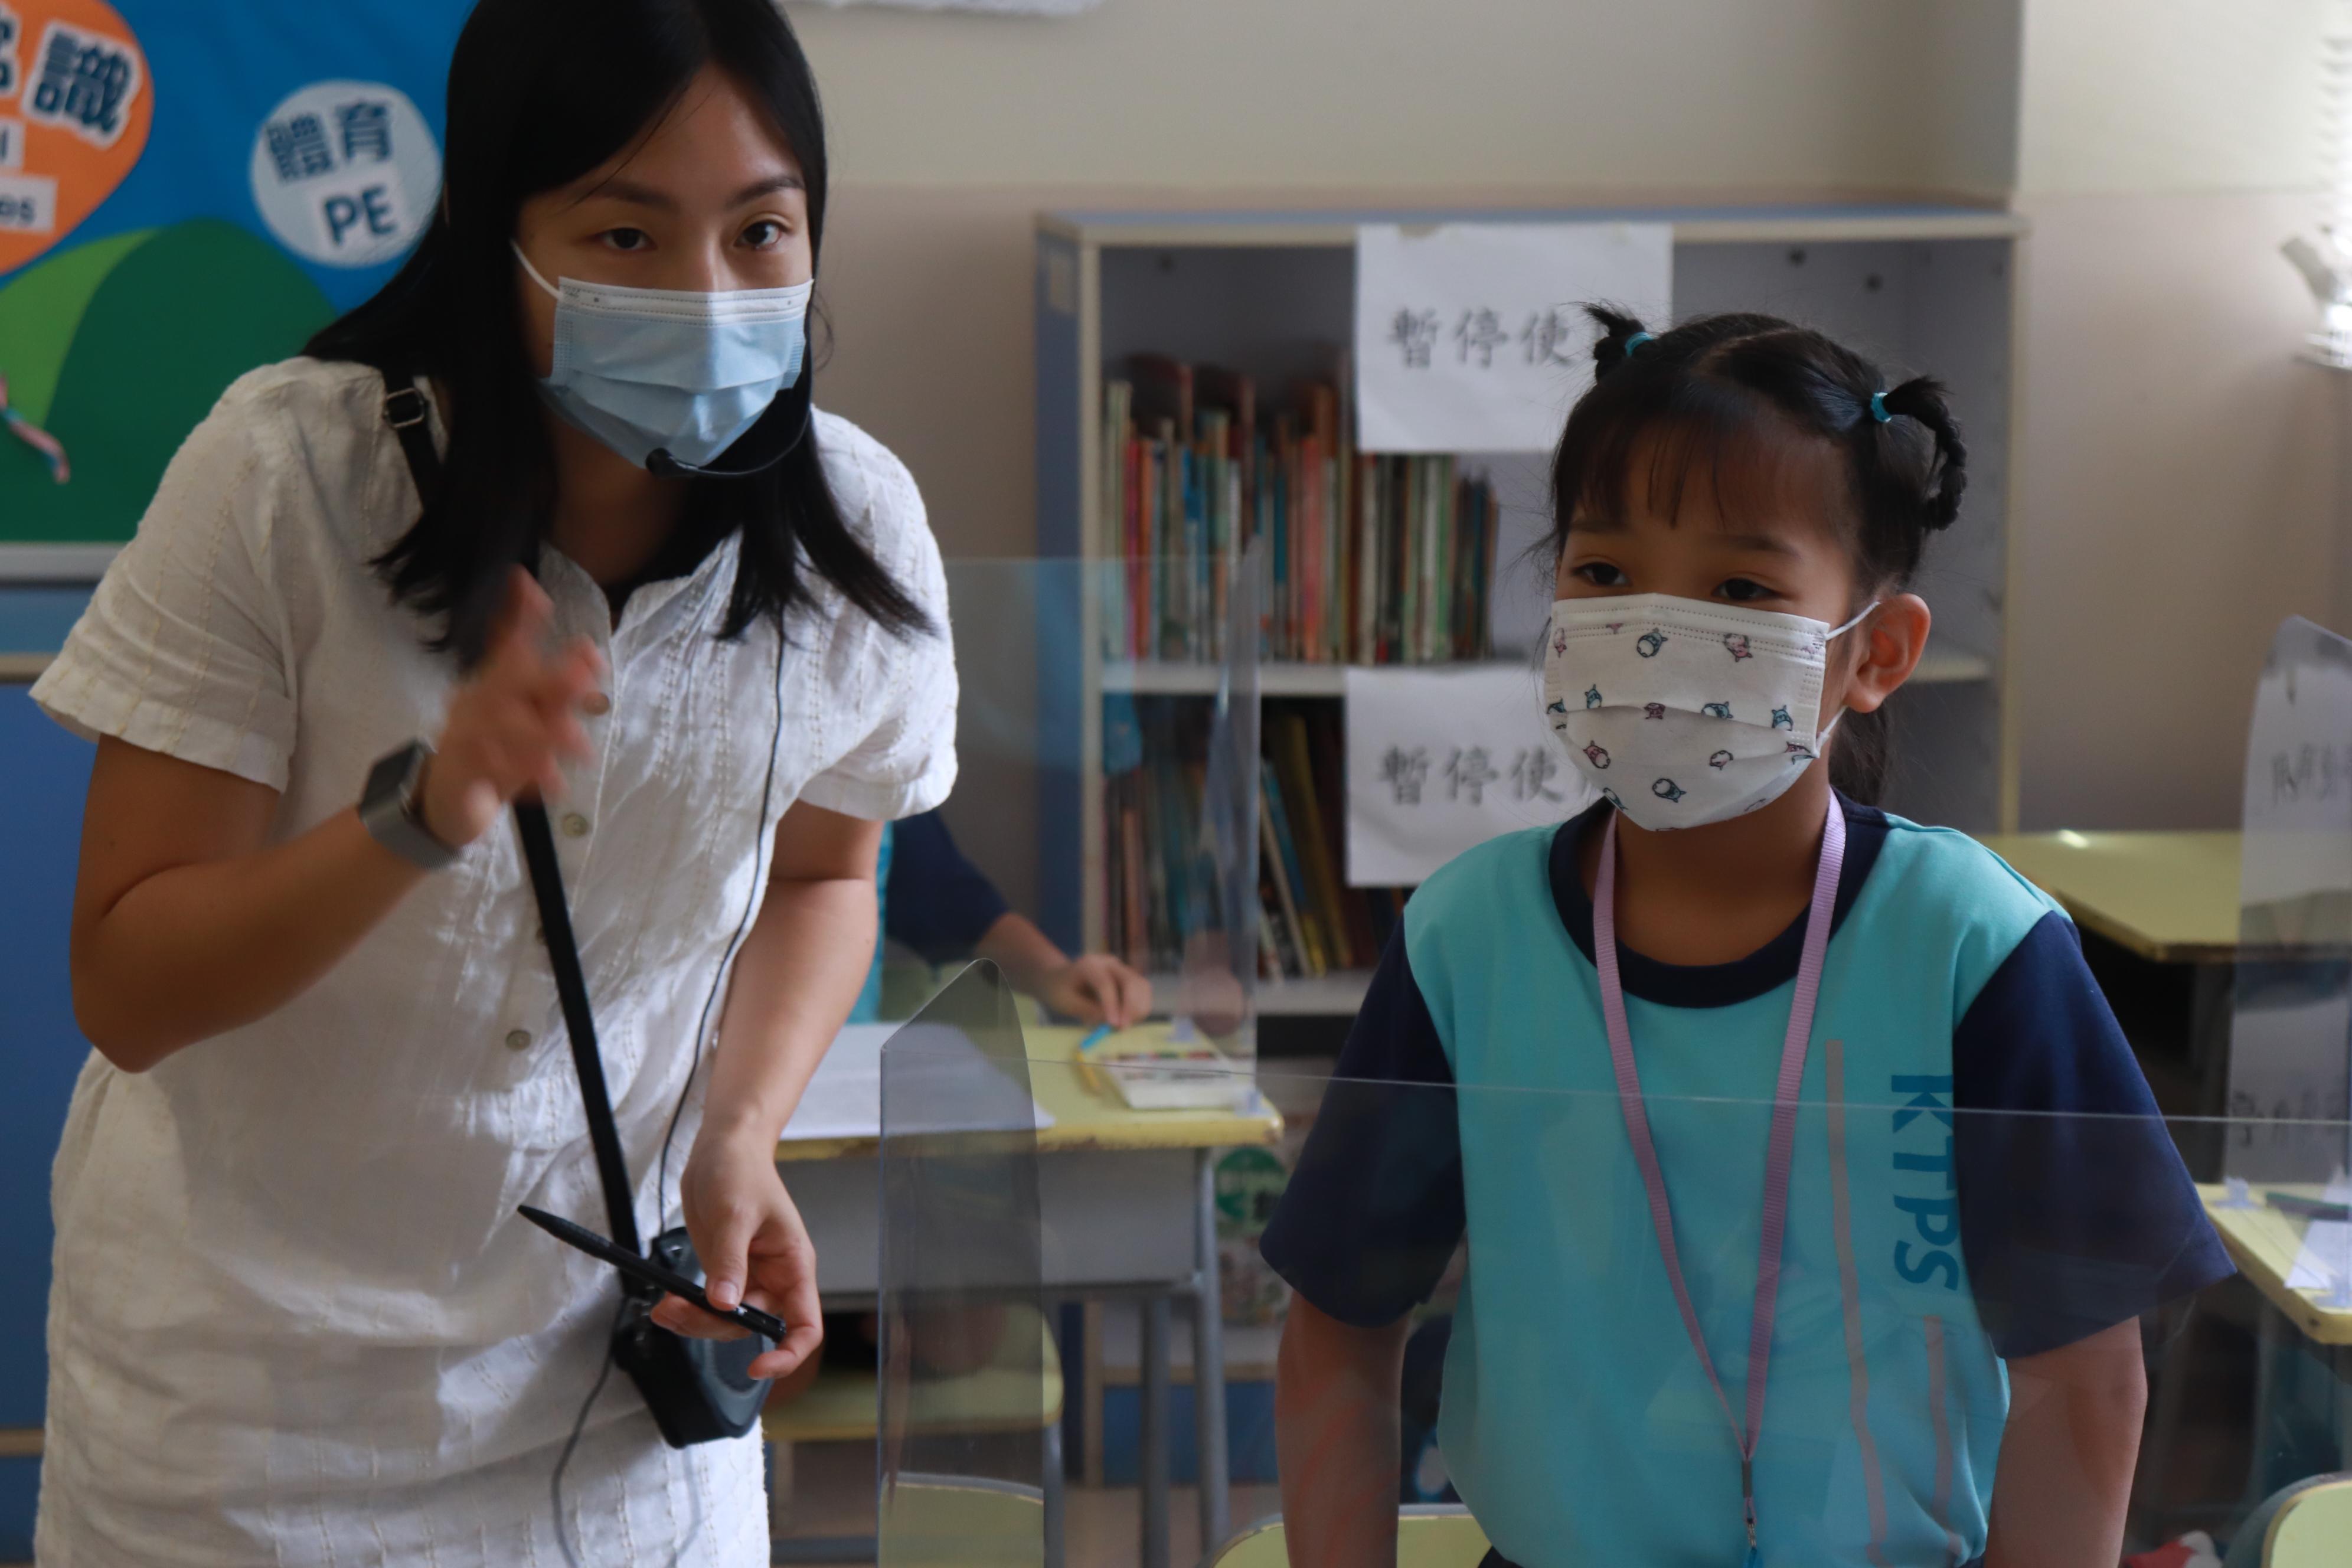 http://keito.school.hk/sites/default/files/img_6581.jpg